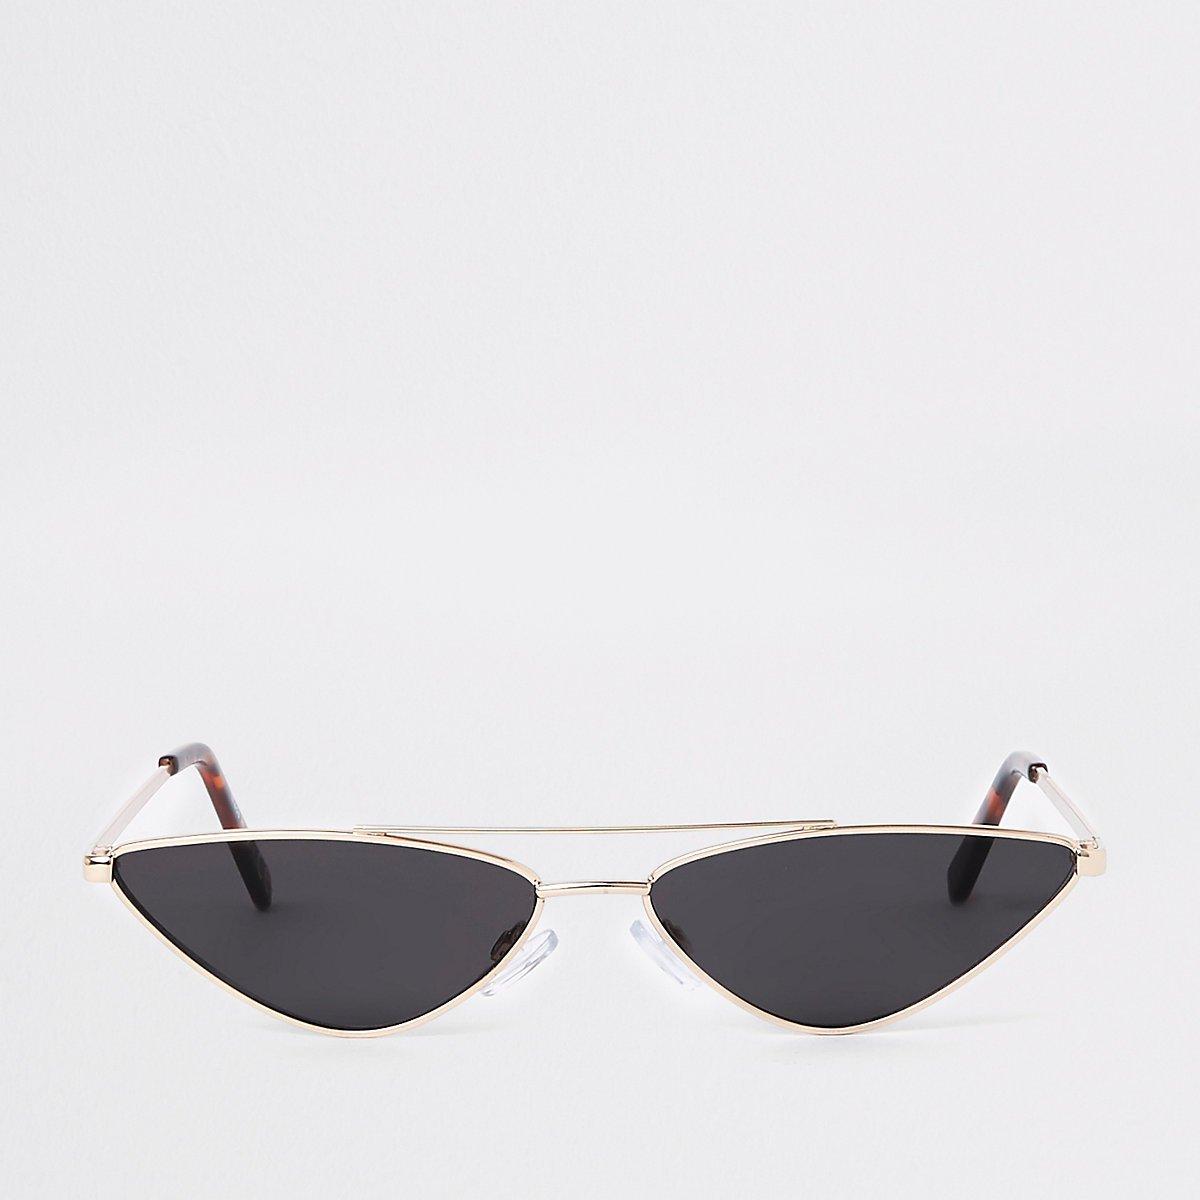 Gold metal frame slim sunglasses - Cat Eye Sunglasses - Sunglasses - women